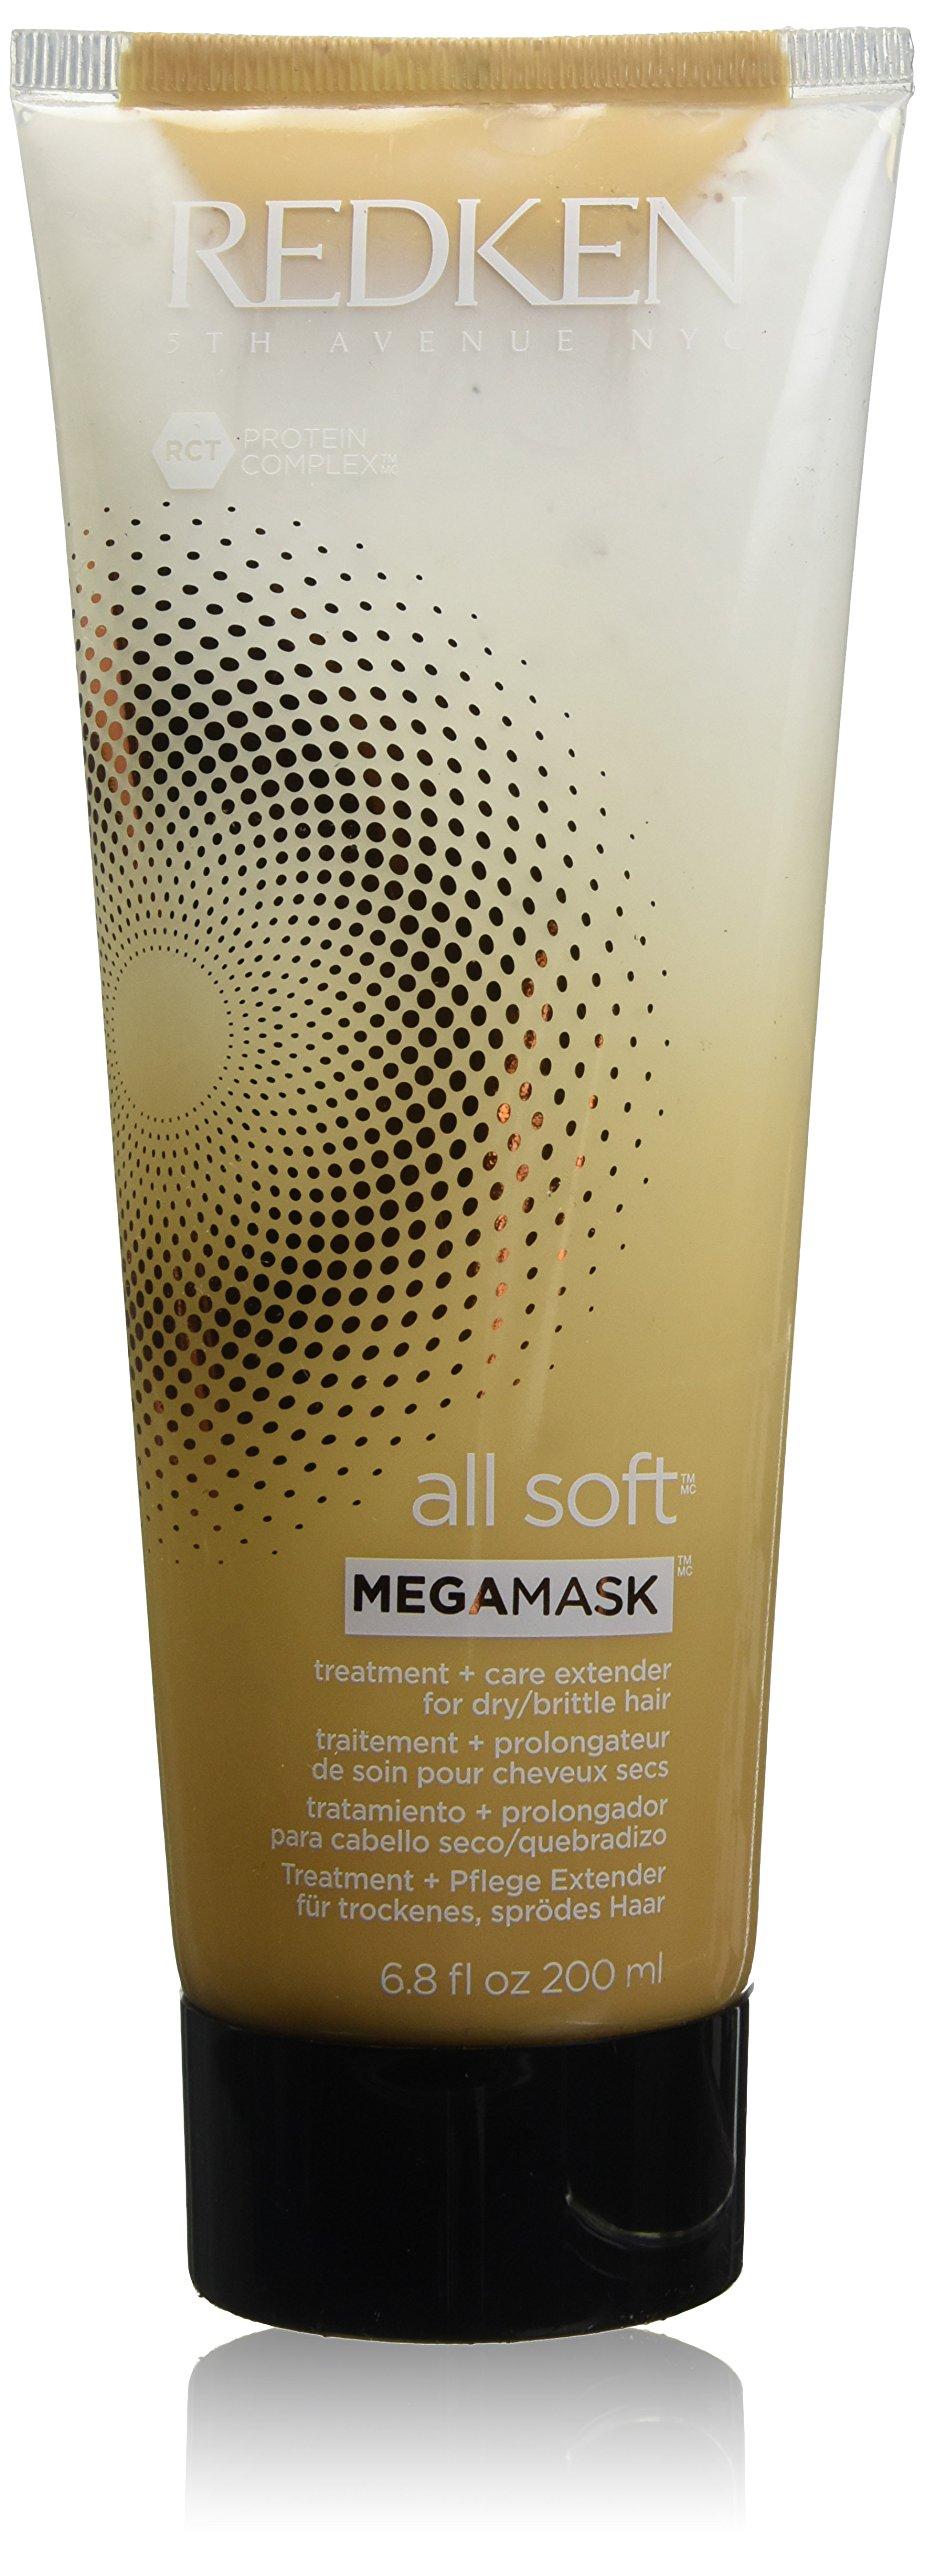 Redken All Soft Mega Mask 6.8 Ounce